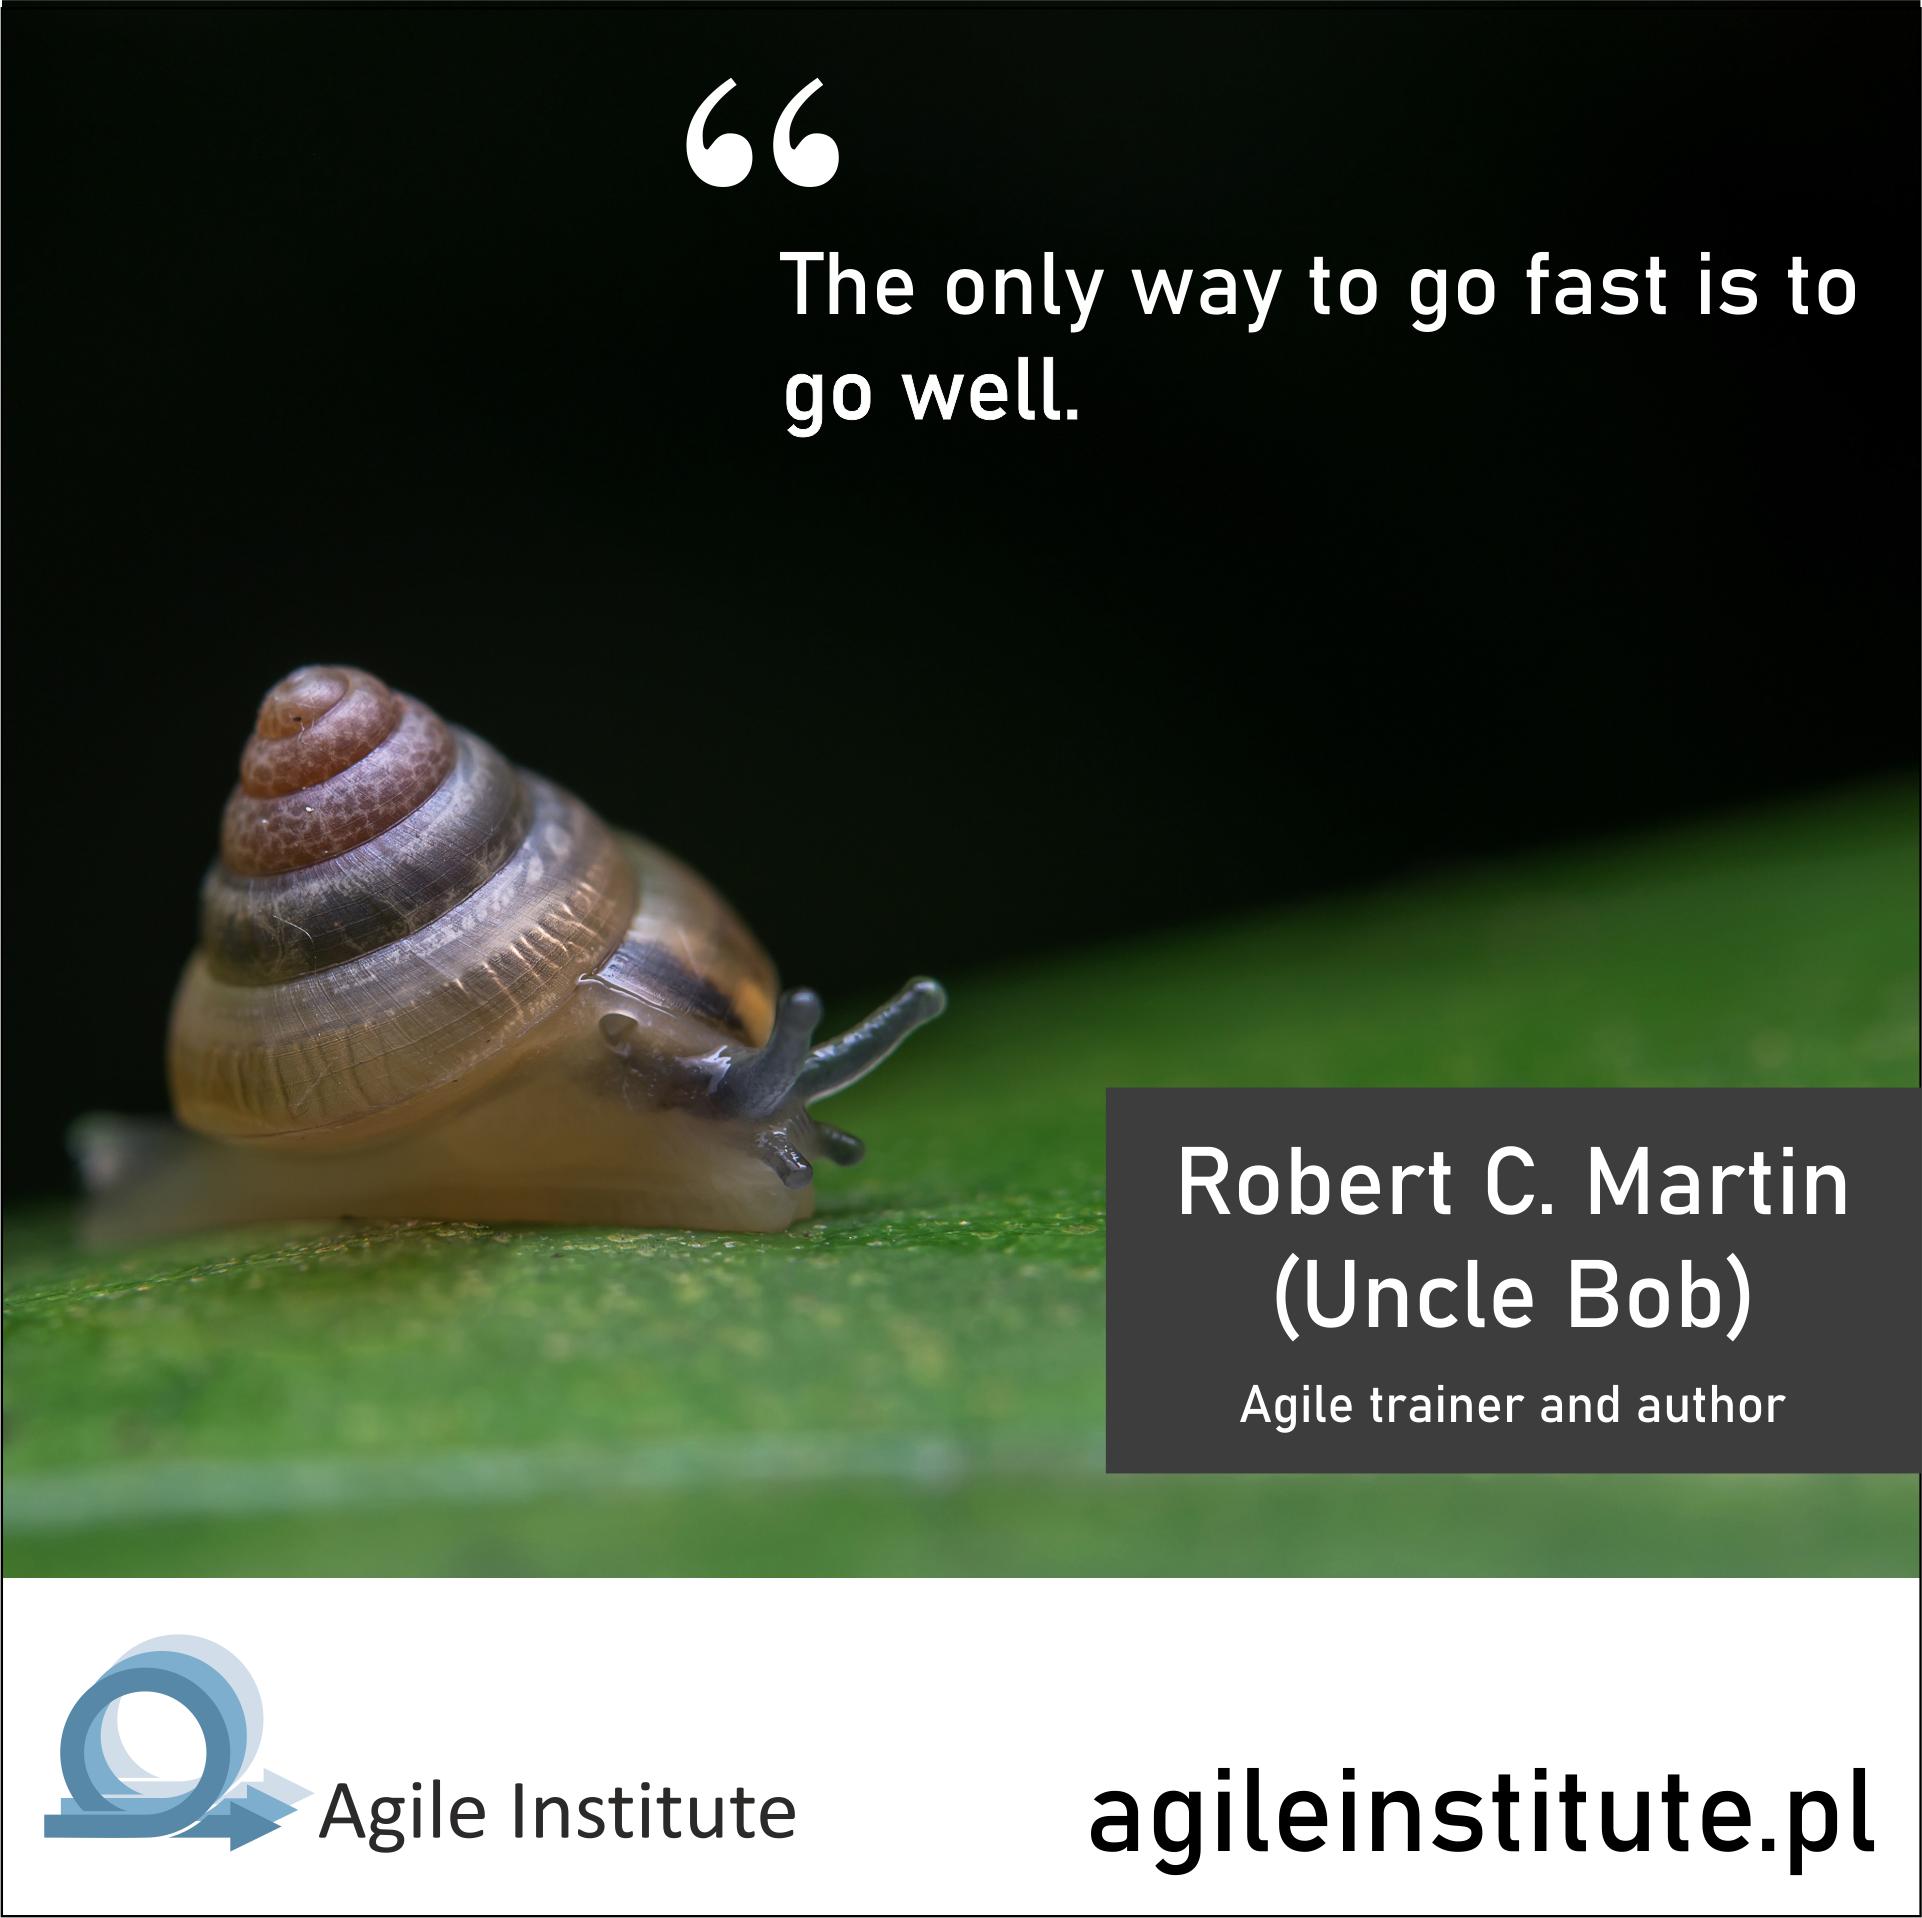 Robert C. Martin Quote